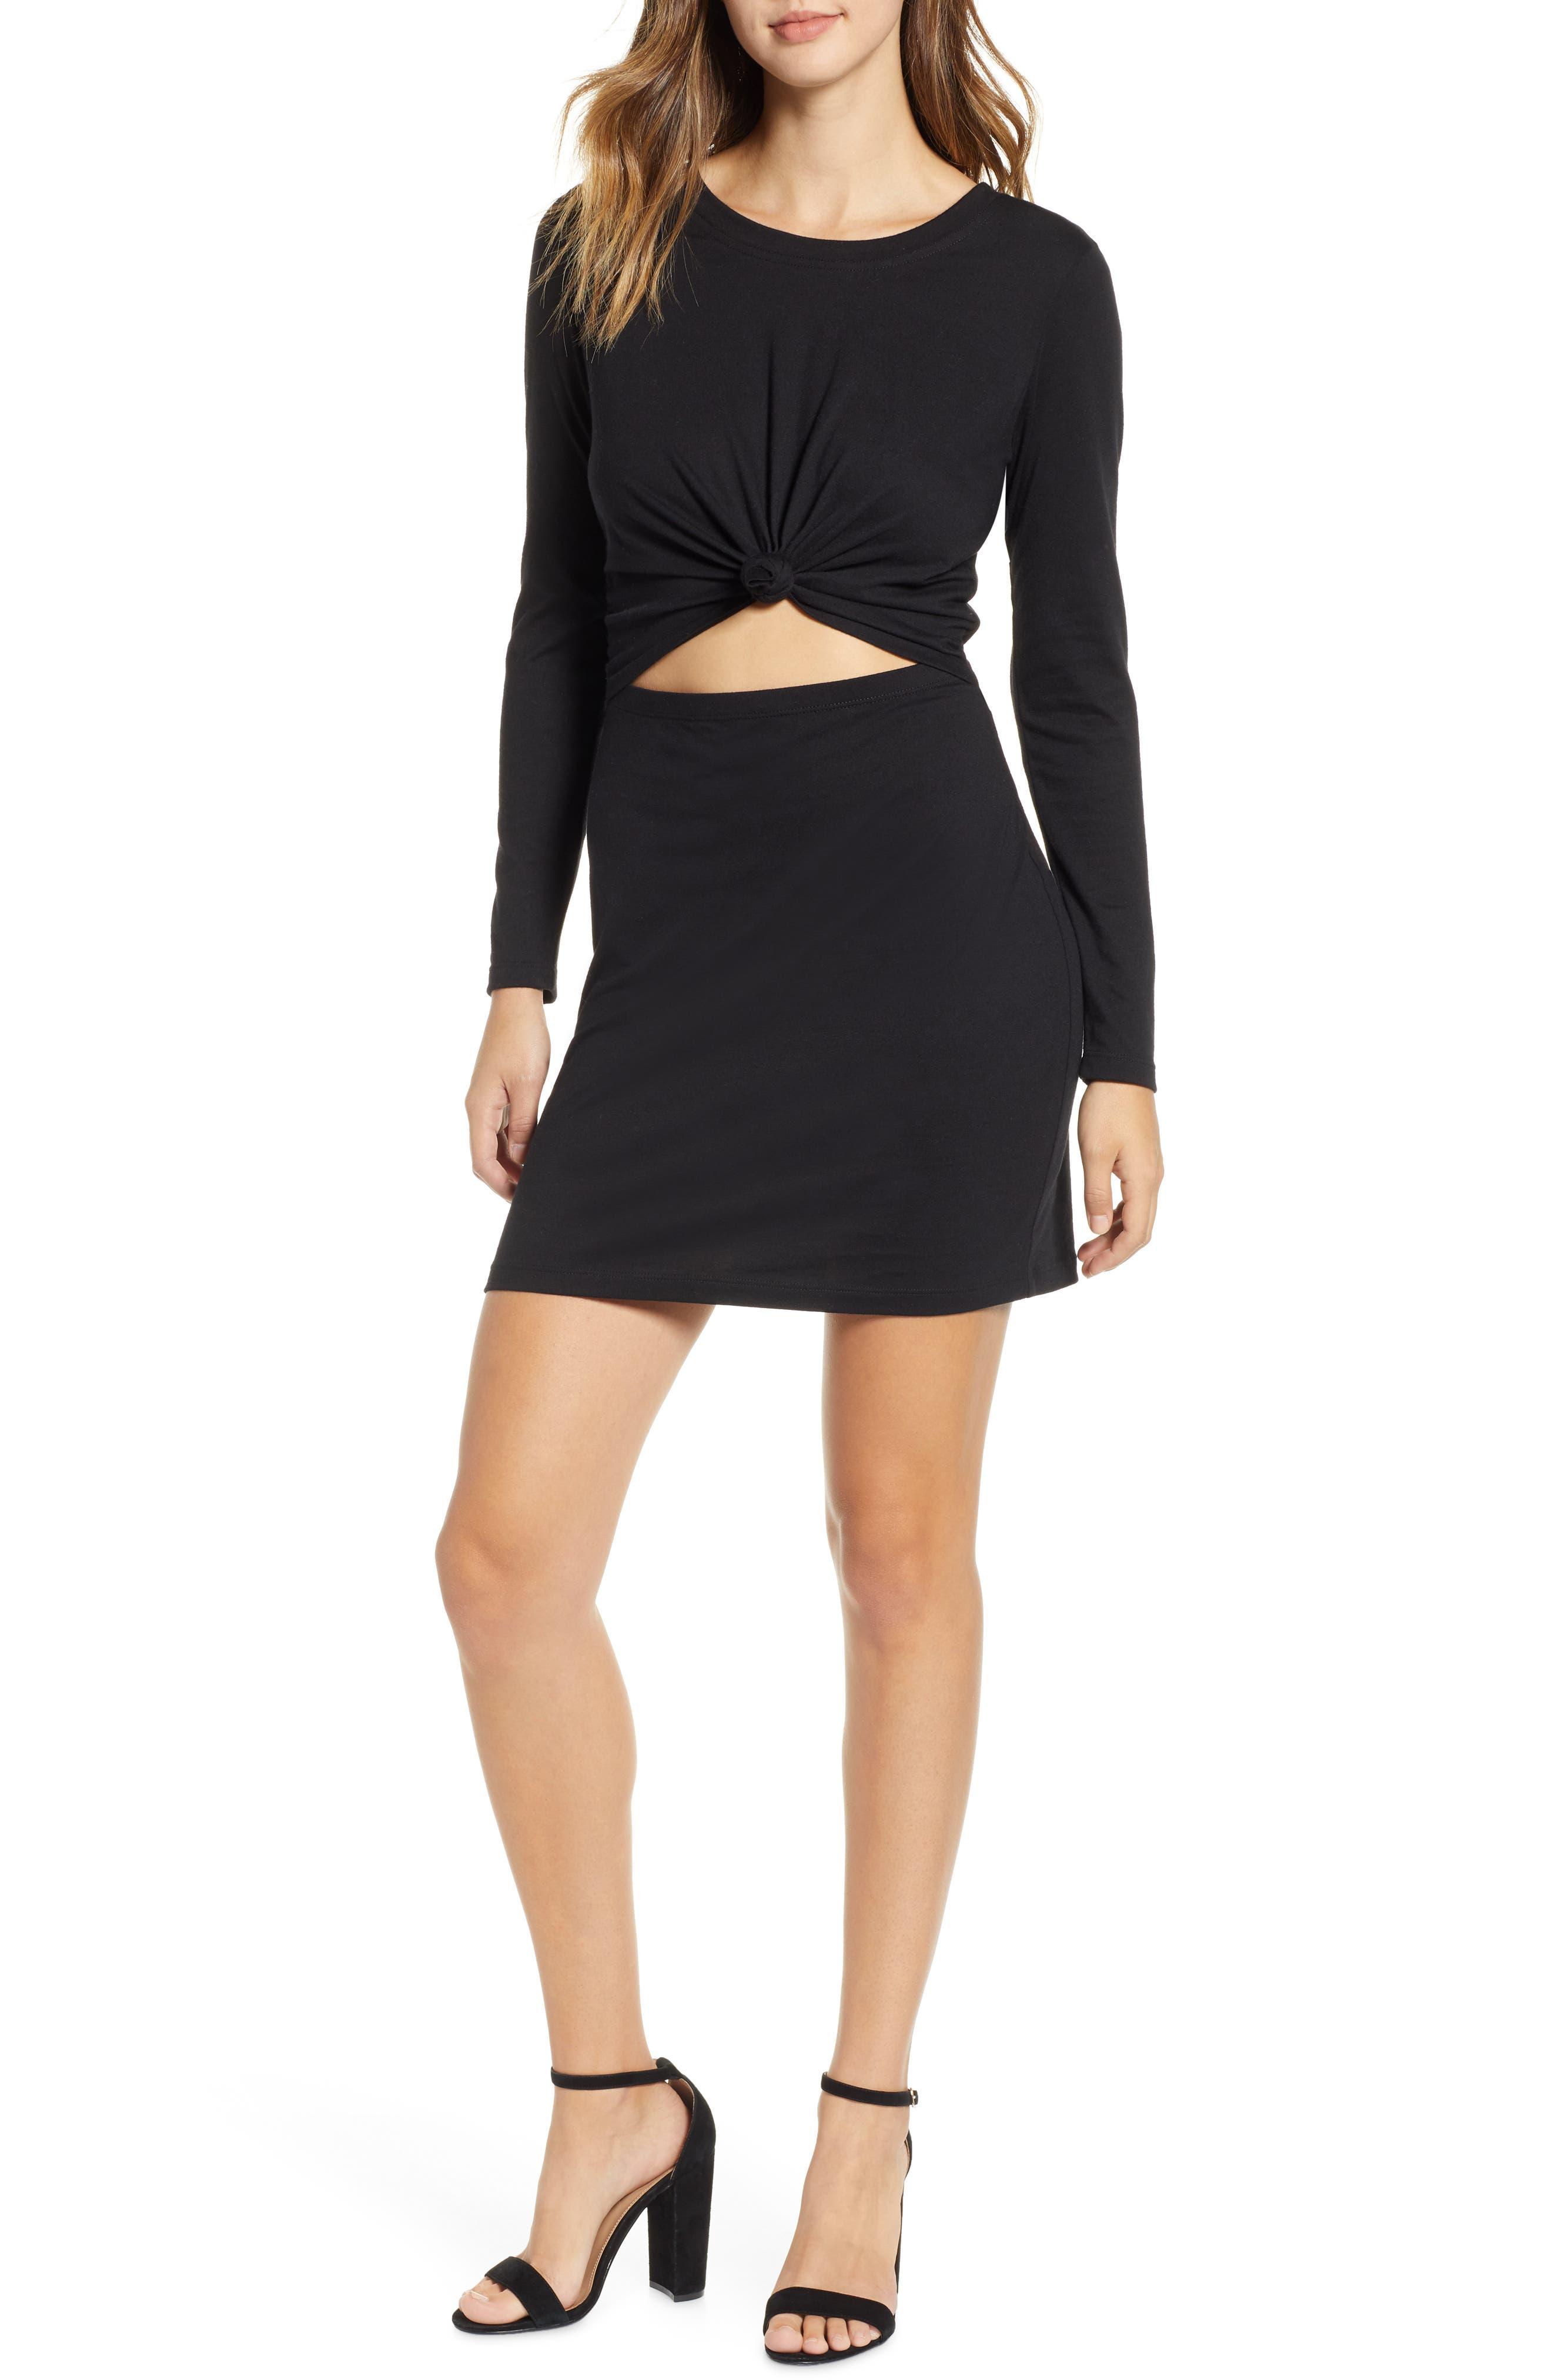 Socialite Knot Front Cutout Dress, Black